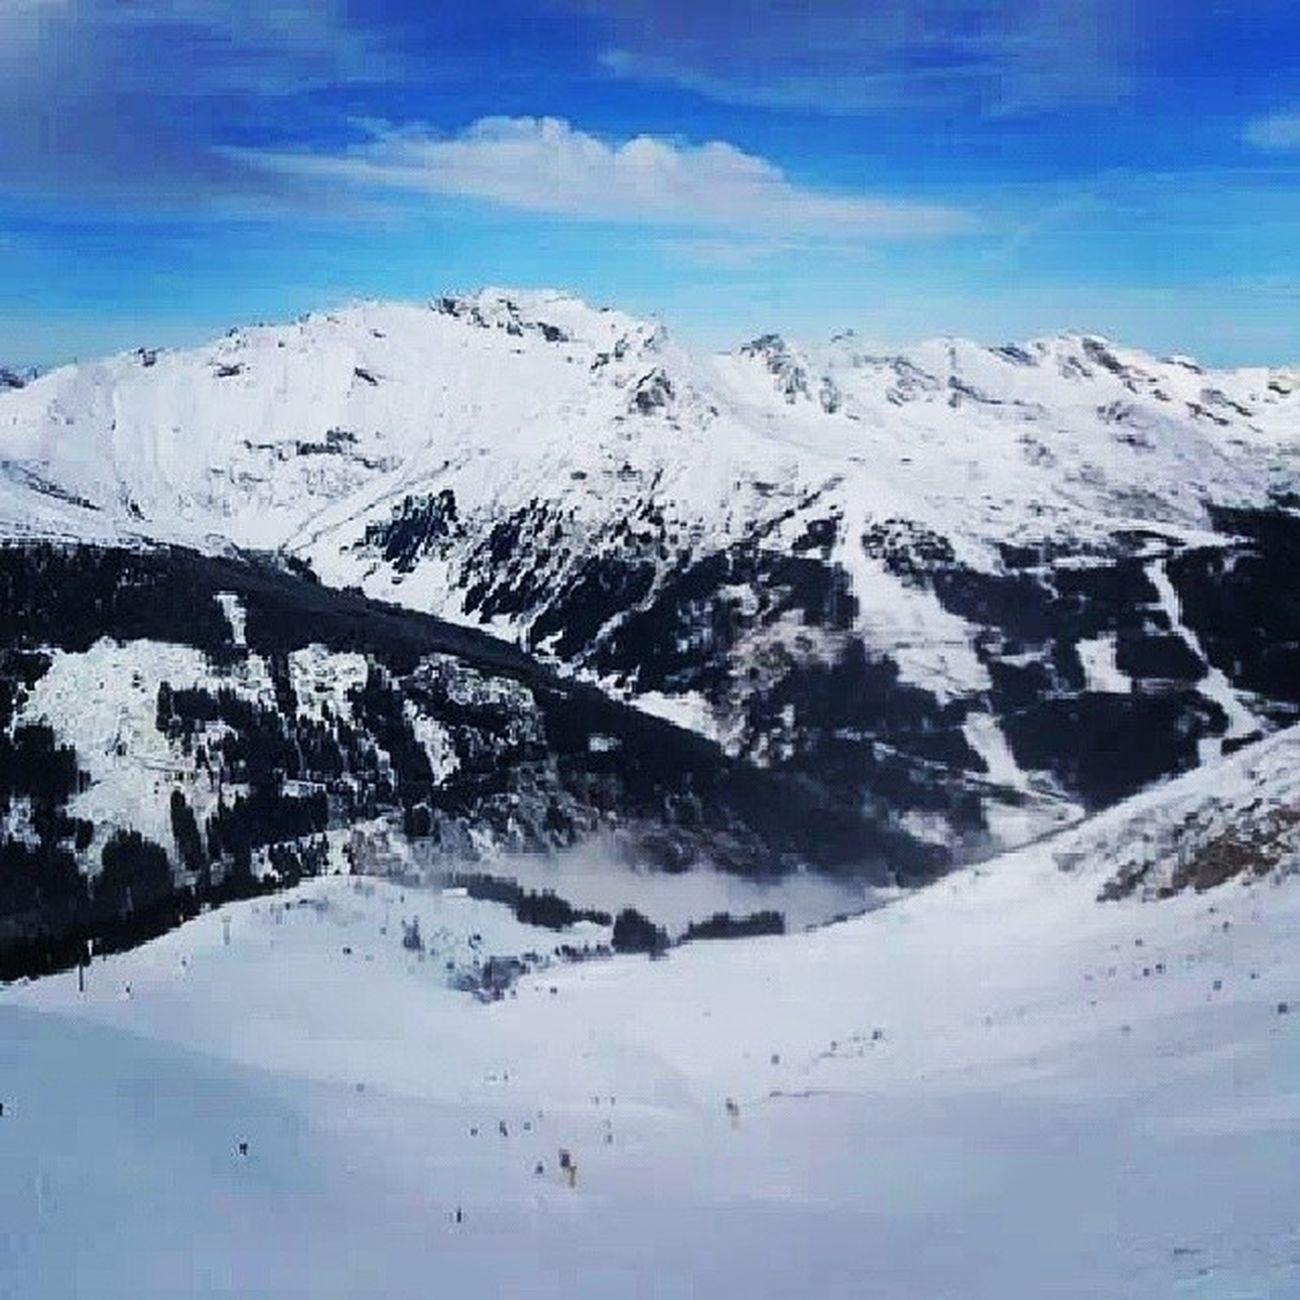 Badgastein <3 Badgastein  österrike Asniceskid åkning